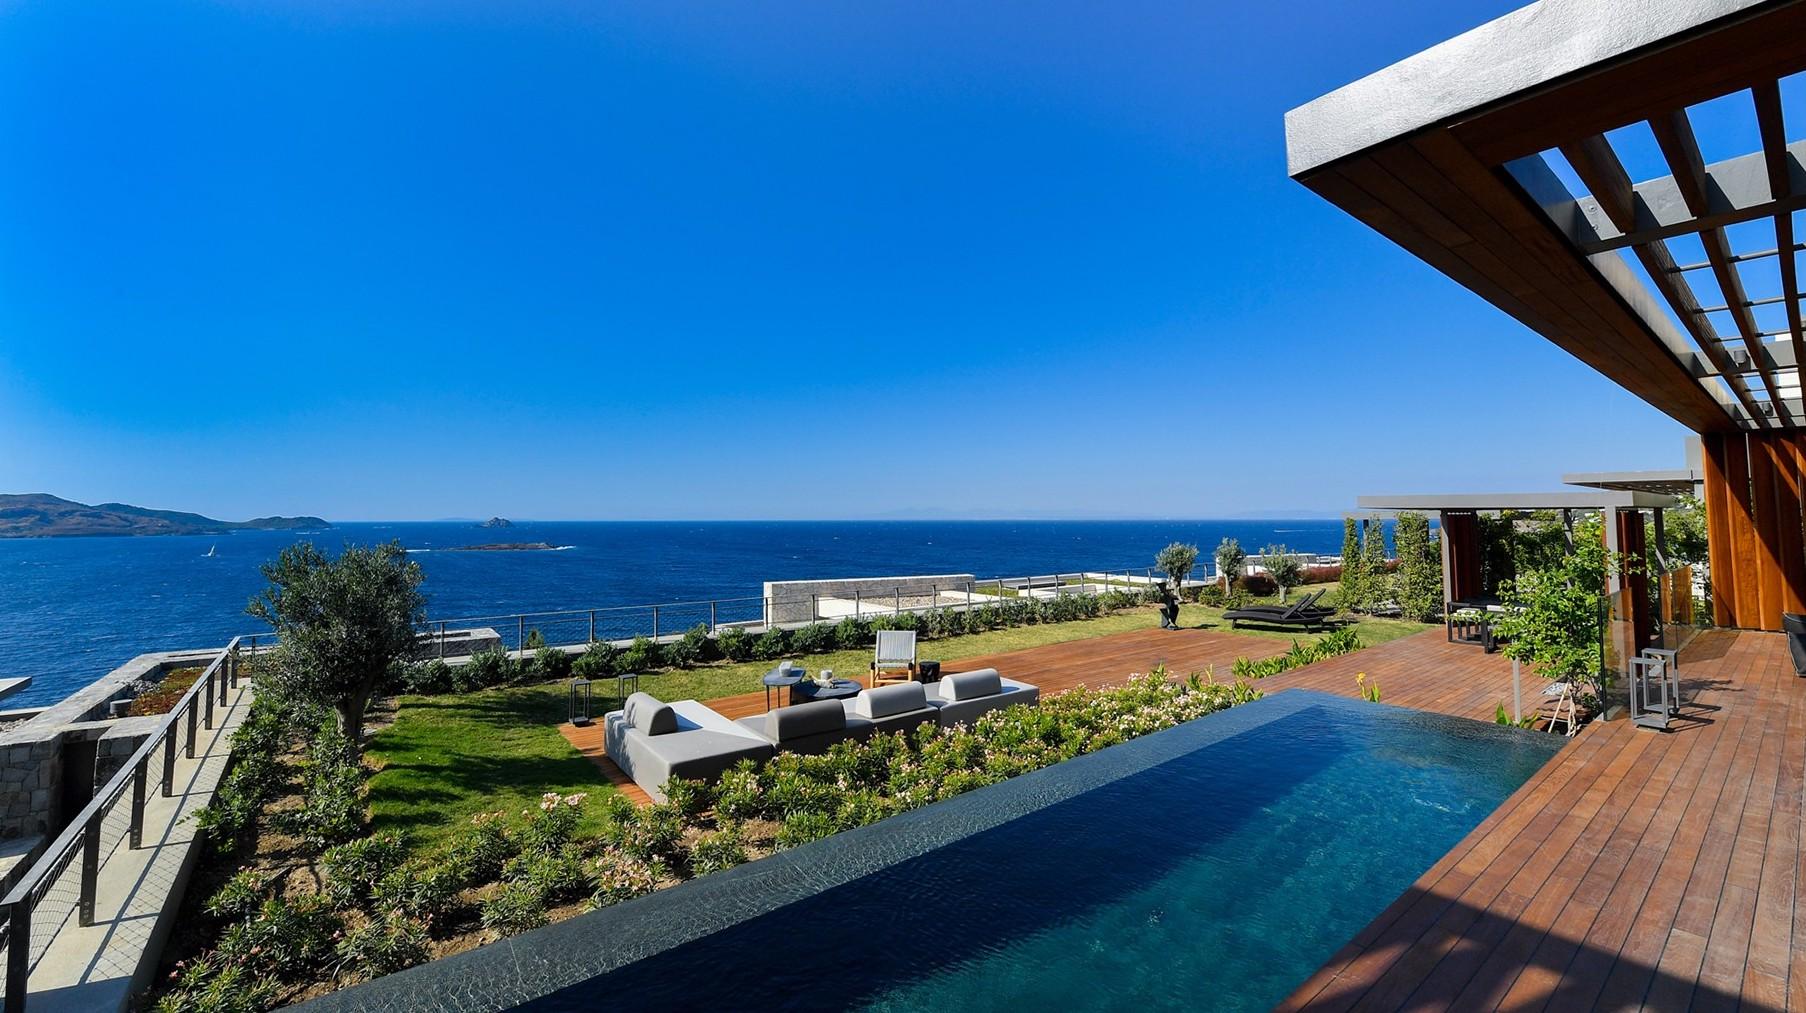 Ritz Carlton Residences Bodrum Turkey